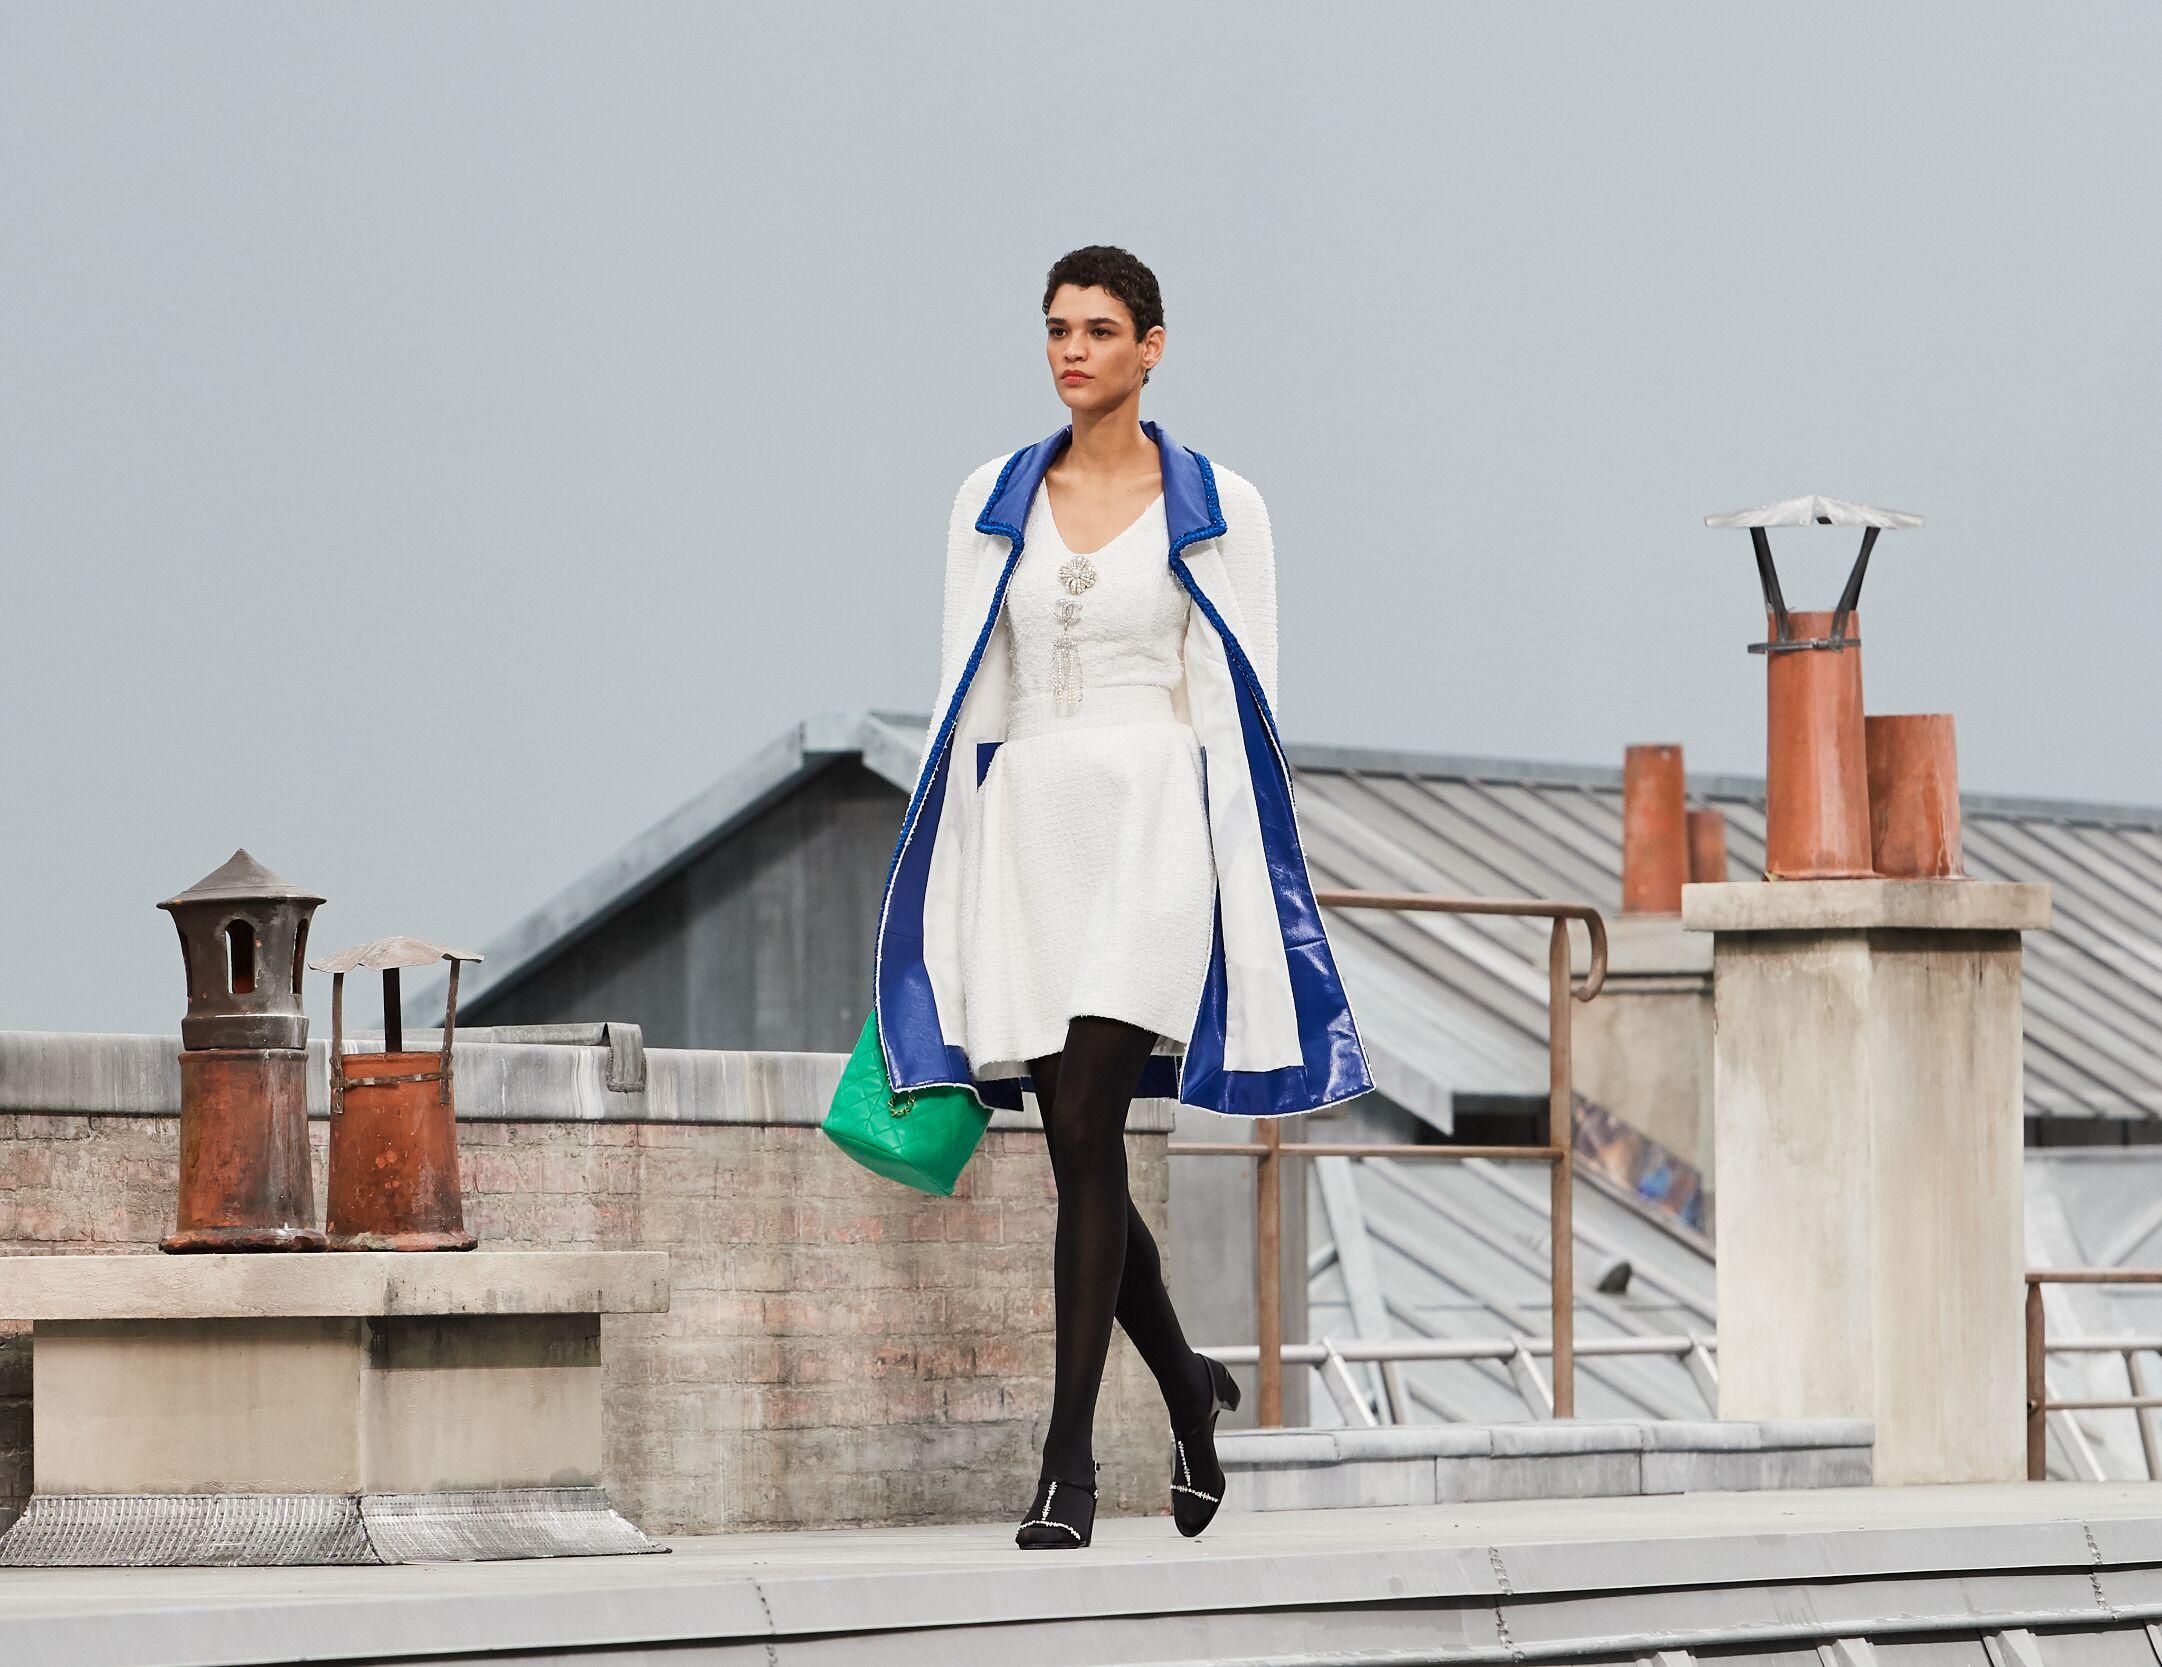 Chanel Spring 2020 Catwalk